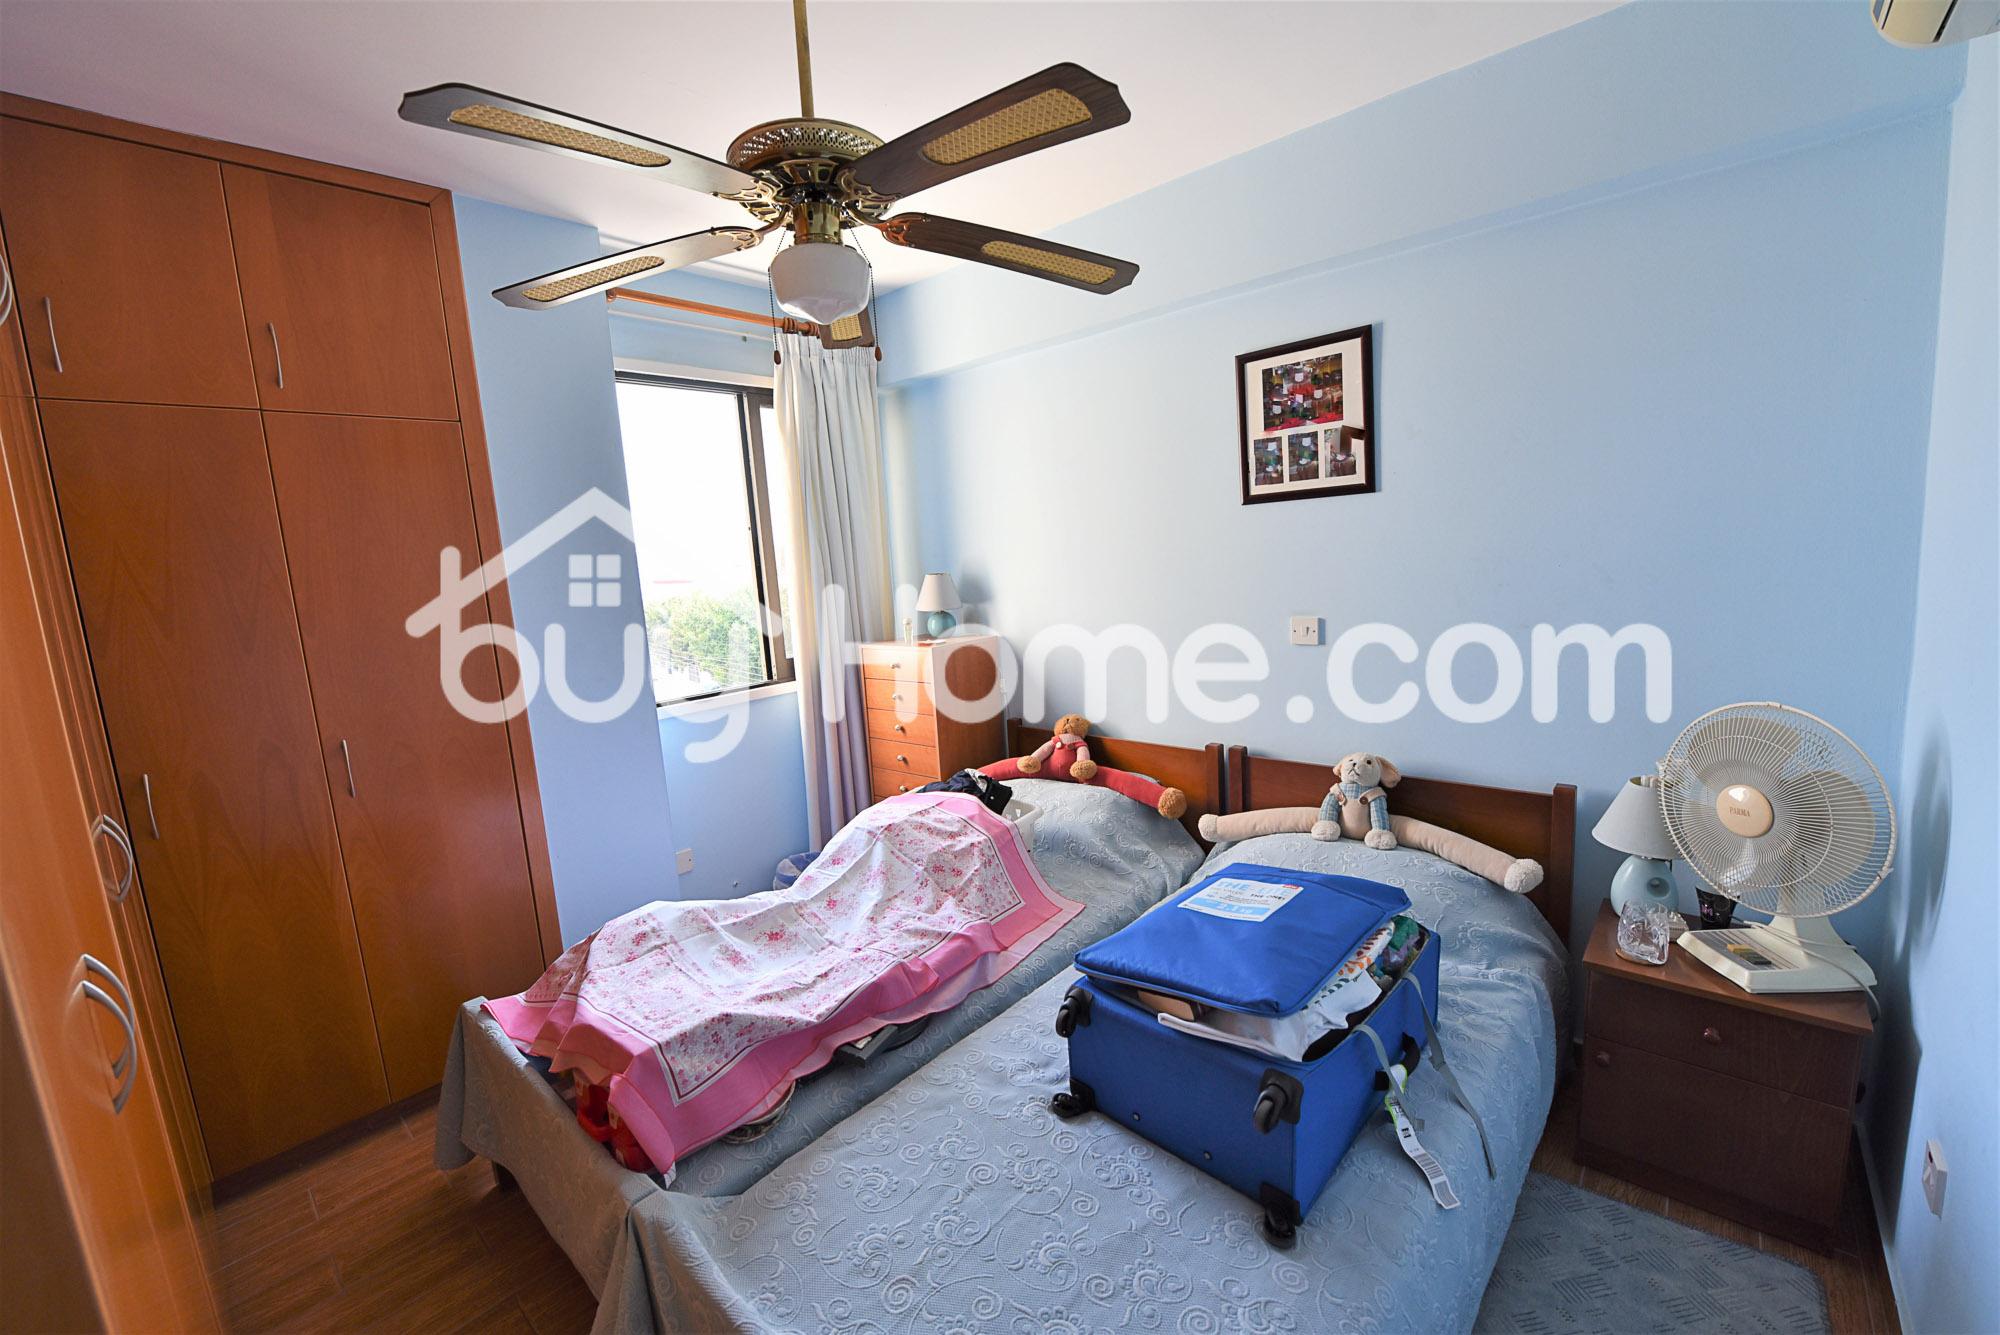 2 Bedroom Apt (Total Area 130m2) | BuyHome